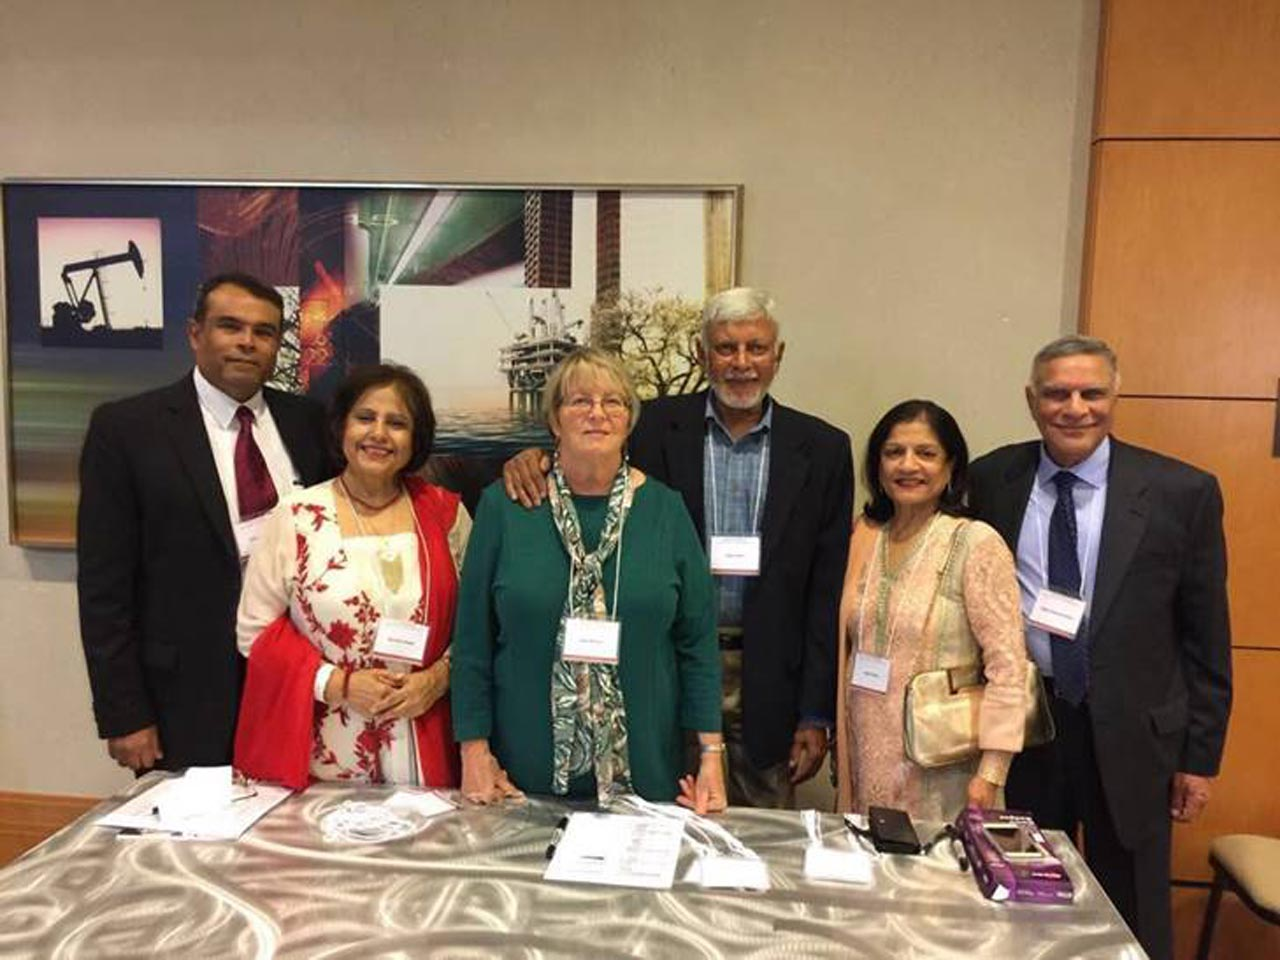 HOST COMMEITTEE Engr. Jawaid Saeedi, Nasreen Saeedi, Kate Wilson, Engr. Moin Khan, Nigar Adam, Engr. Abdul Majid Adam